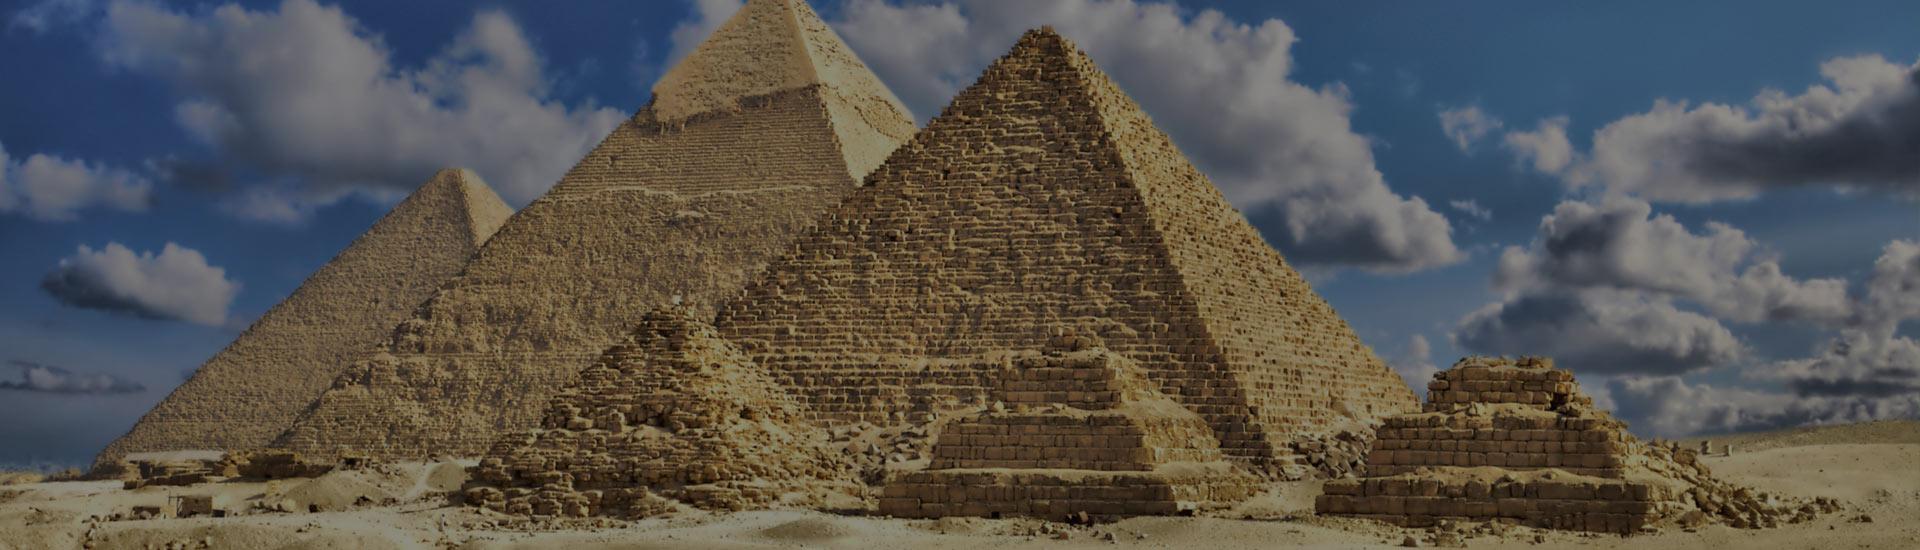 Logistikunternehmen-Ägypten